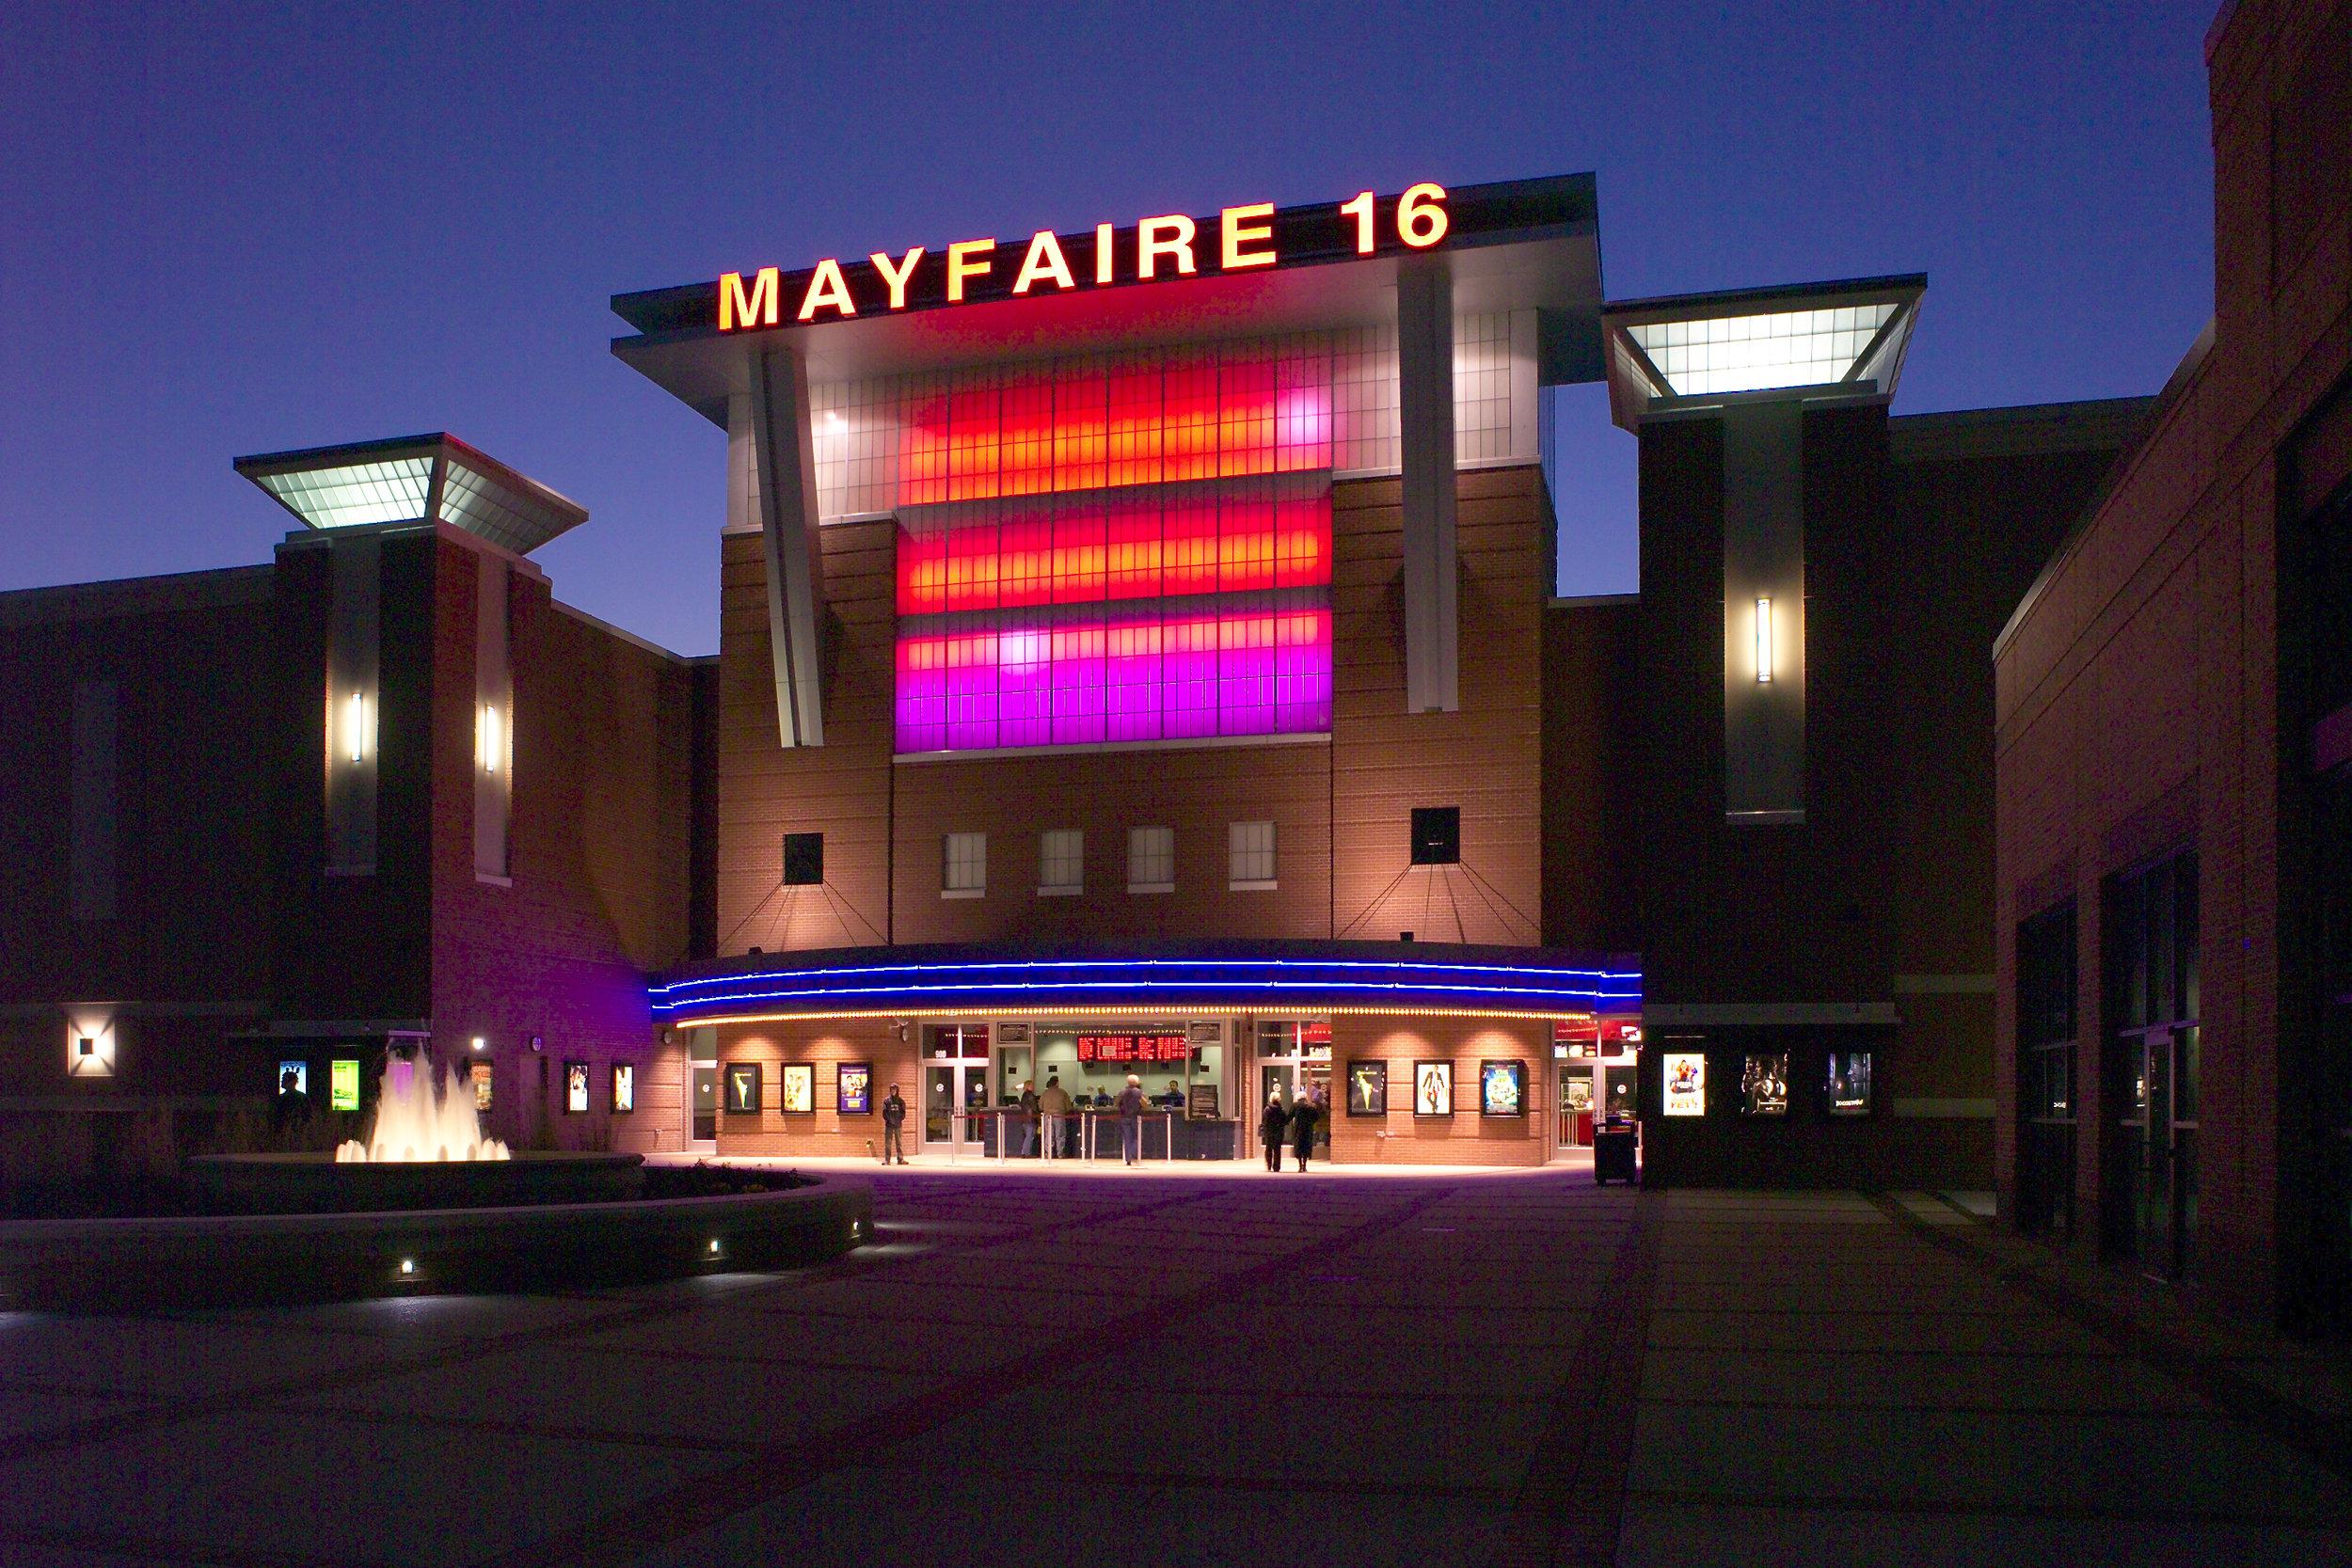 ADW-Entertainment-Mayfaire-16-Wilmington-NC-1.JPG